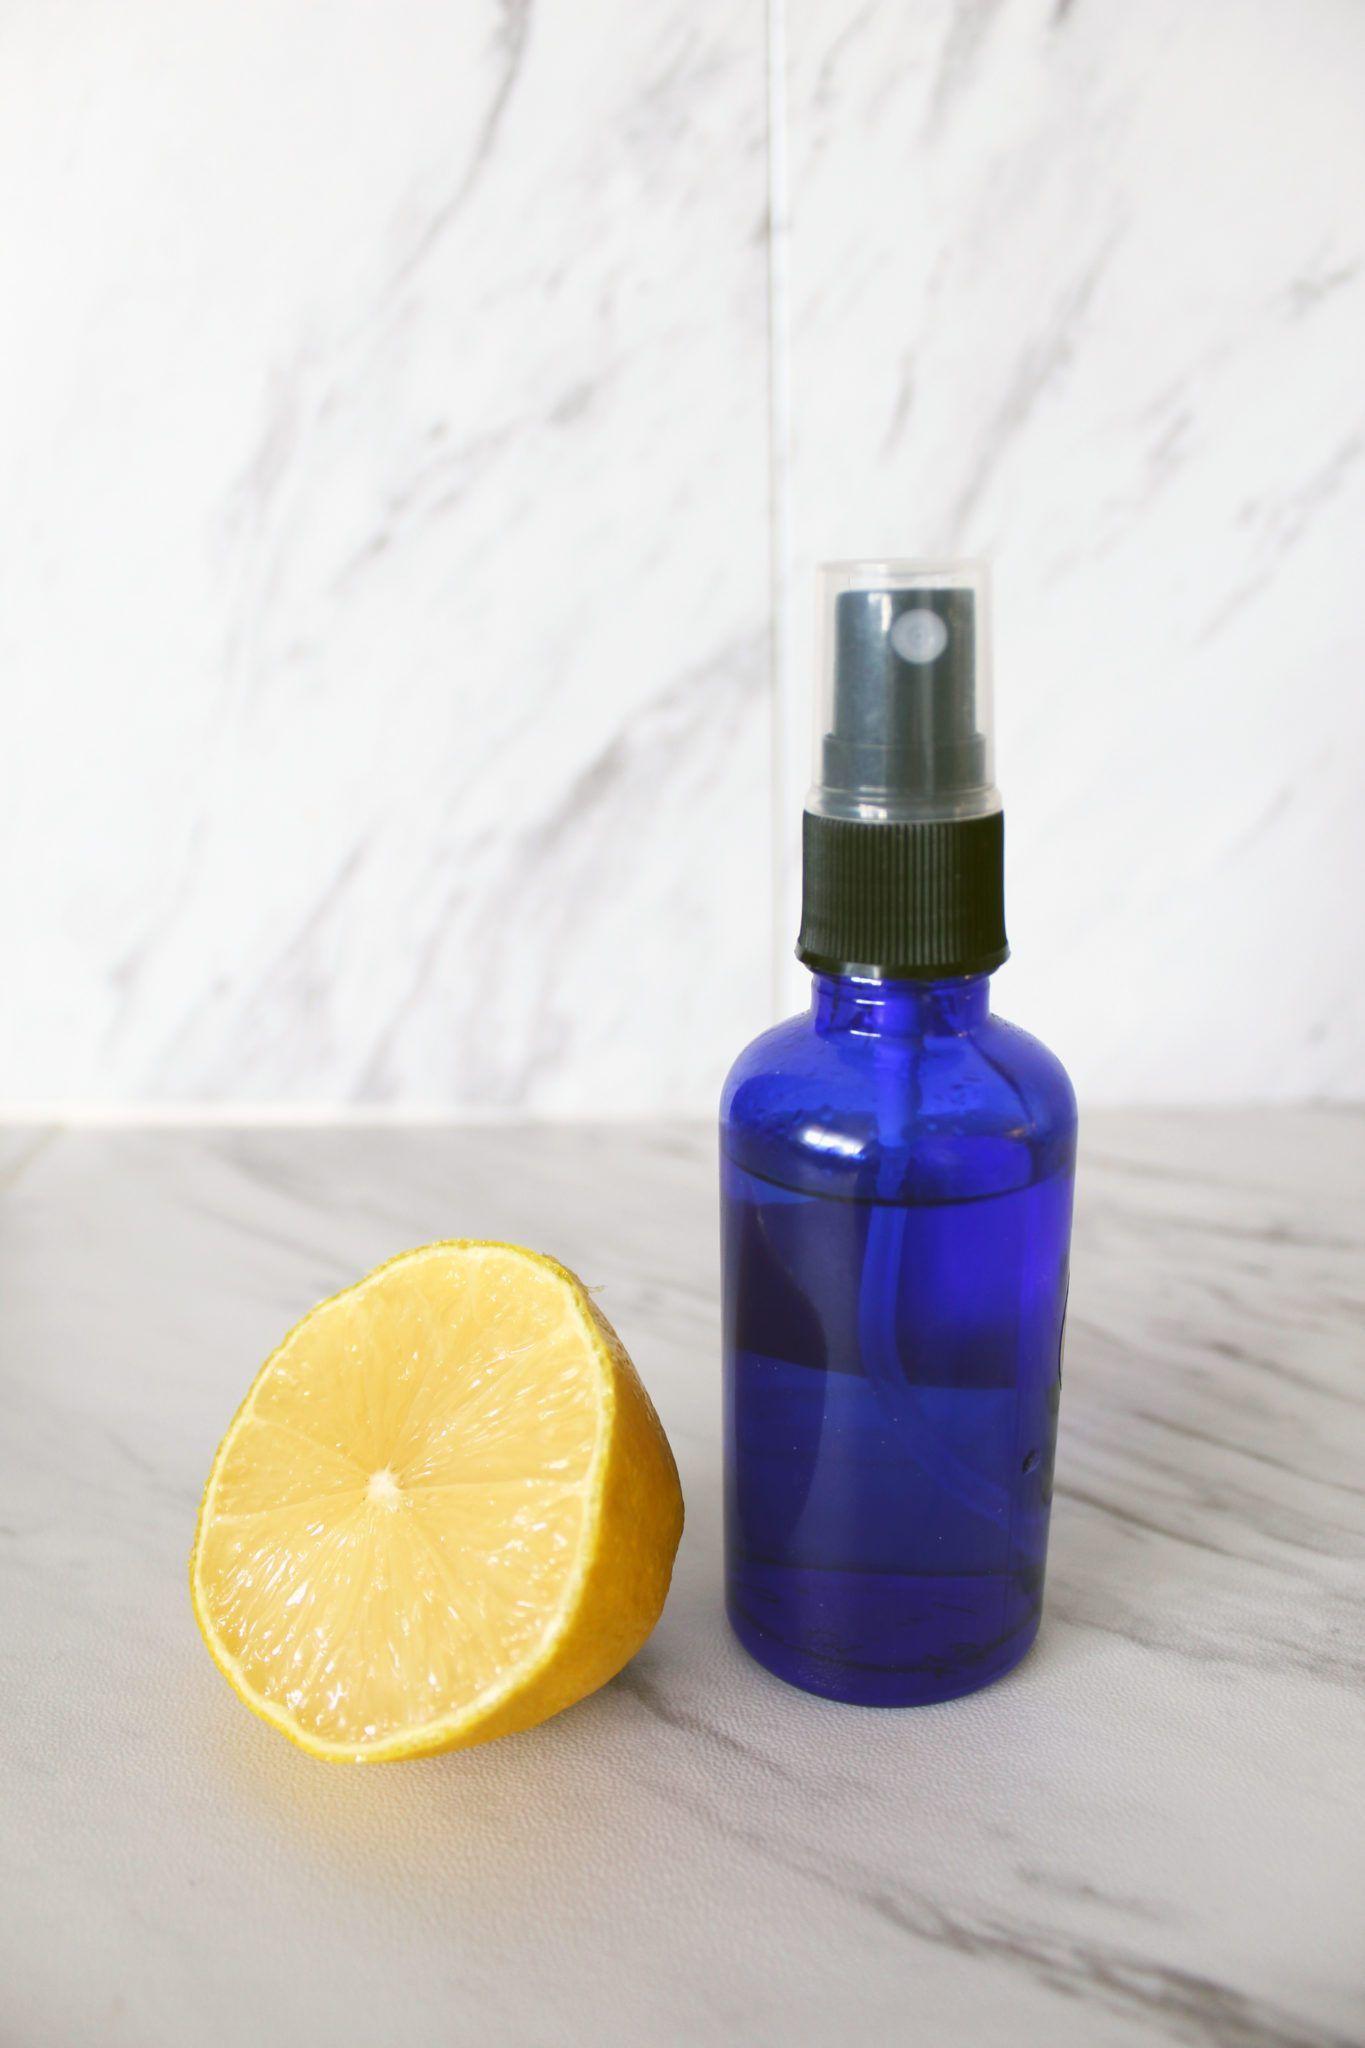 Make This DIY Witch Hazel & Lemon Skin Toner (With images